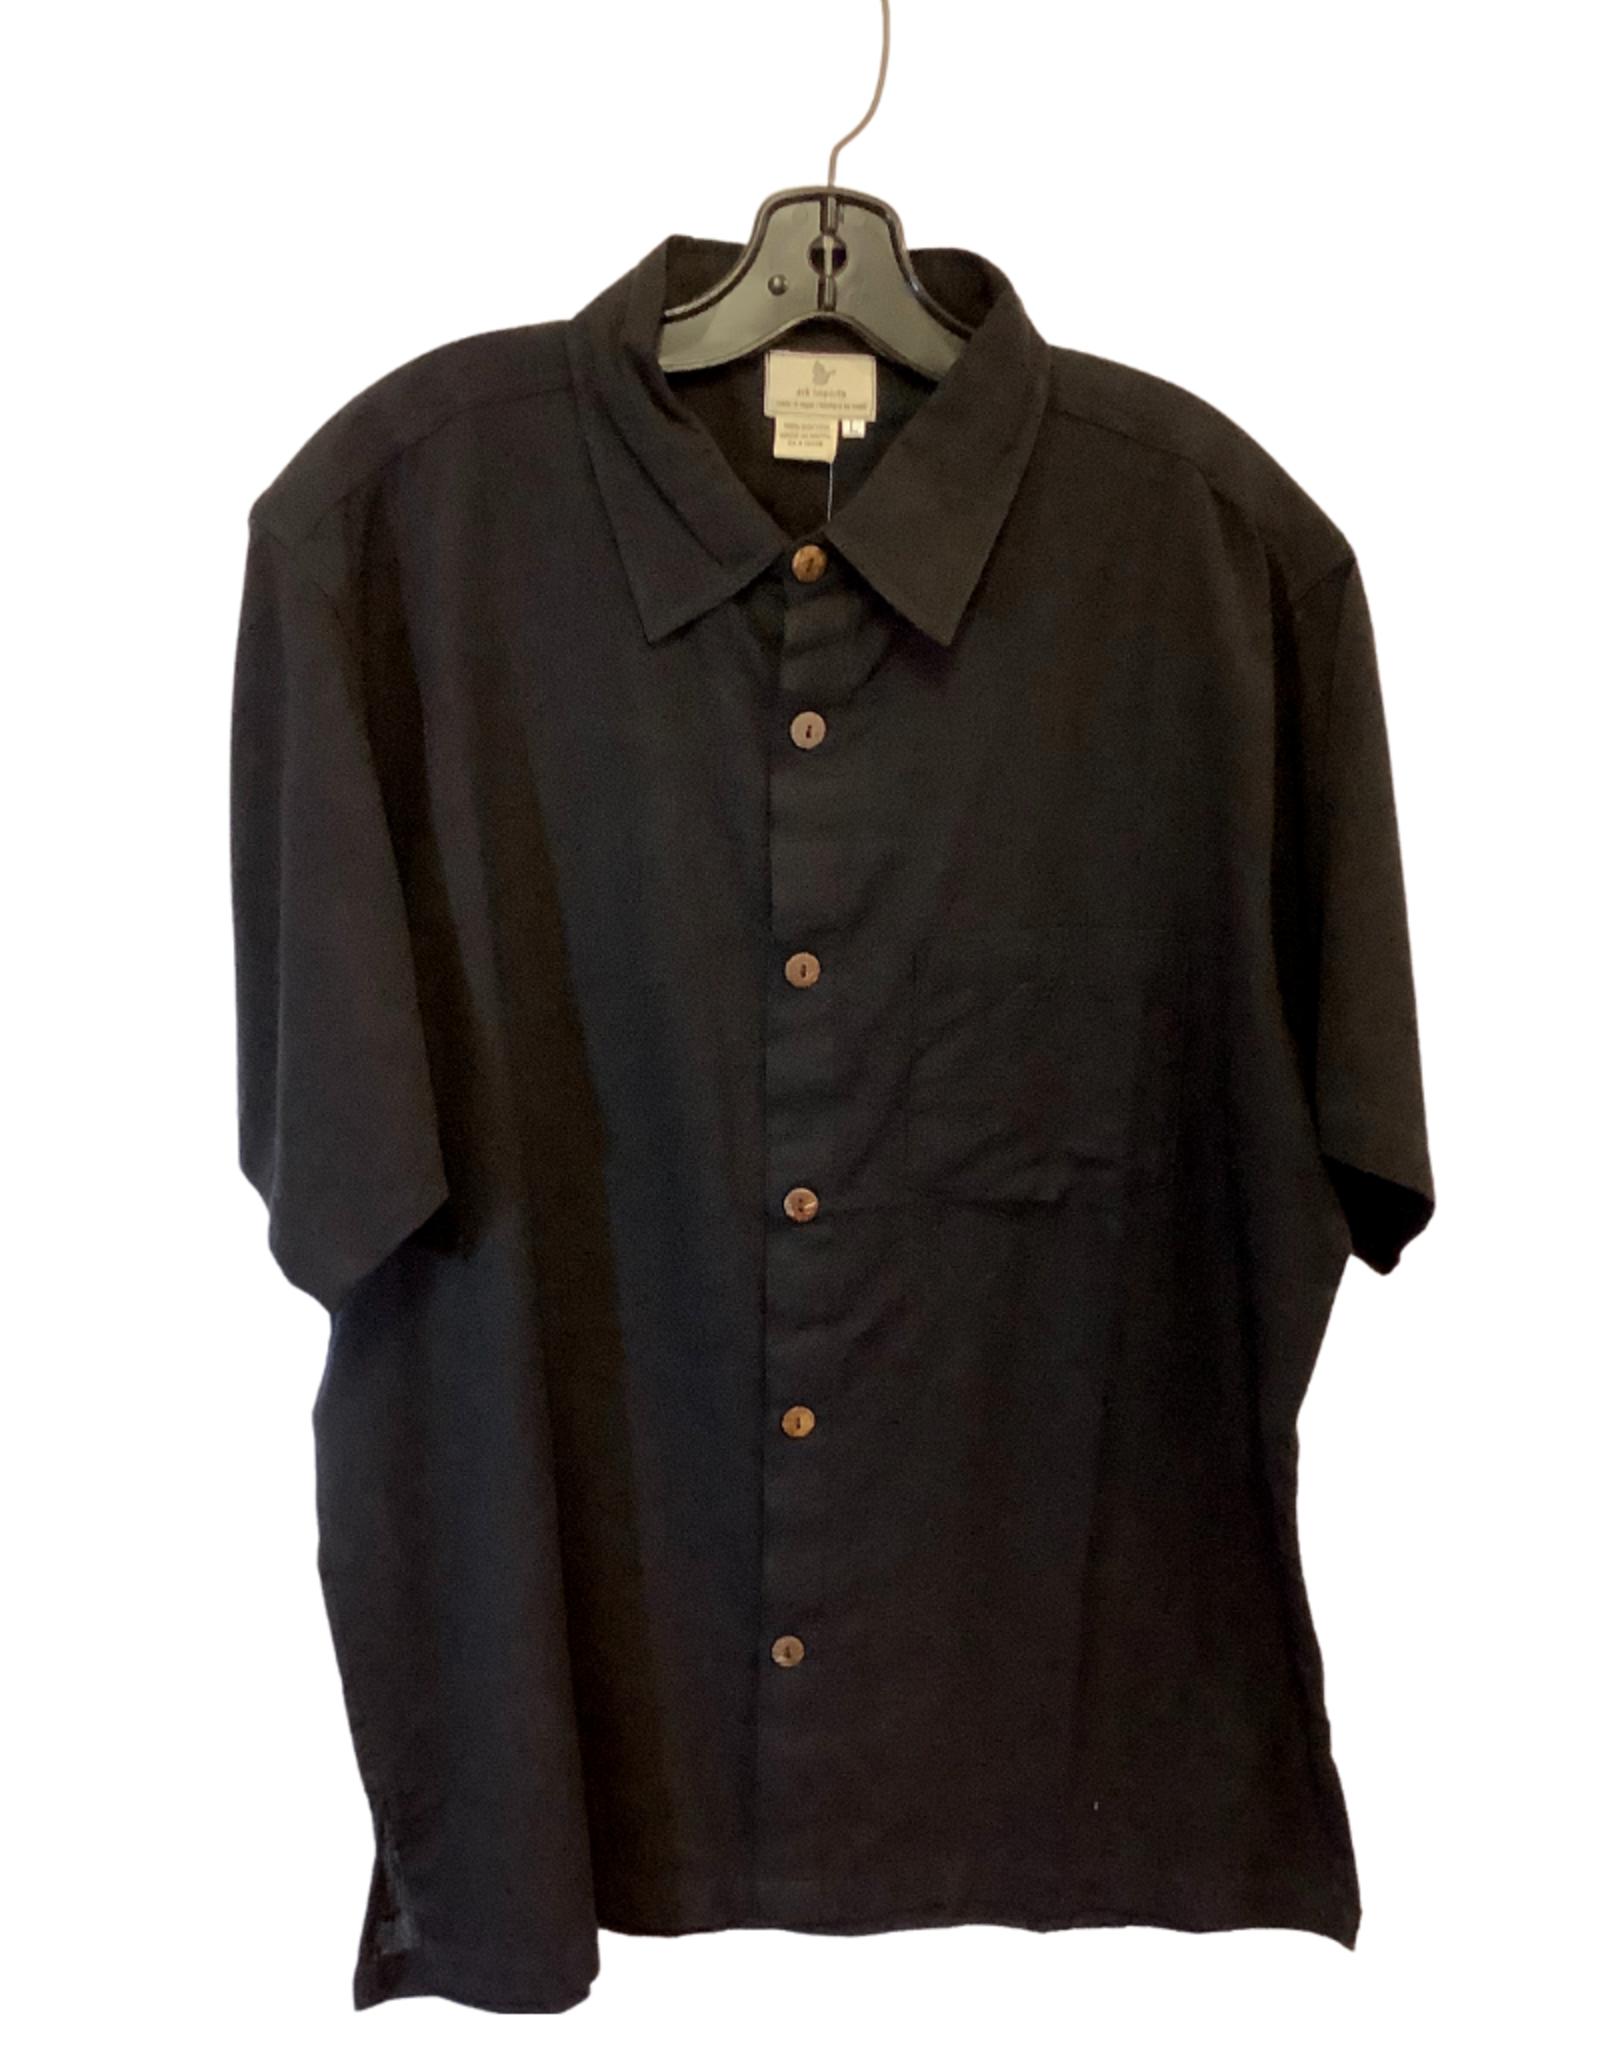 Men's Black Short sleeved shirt, L